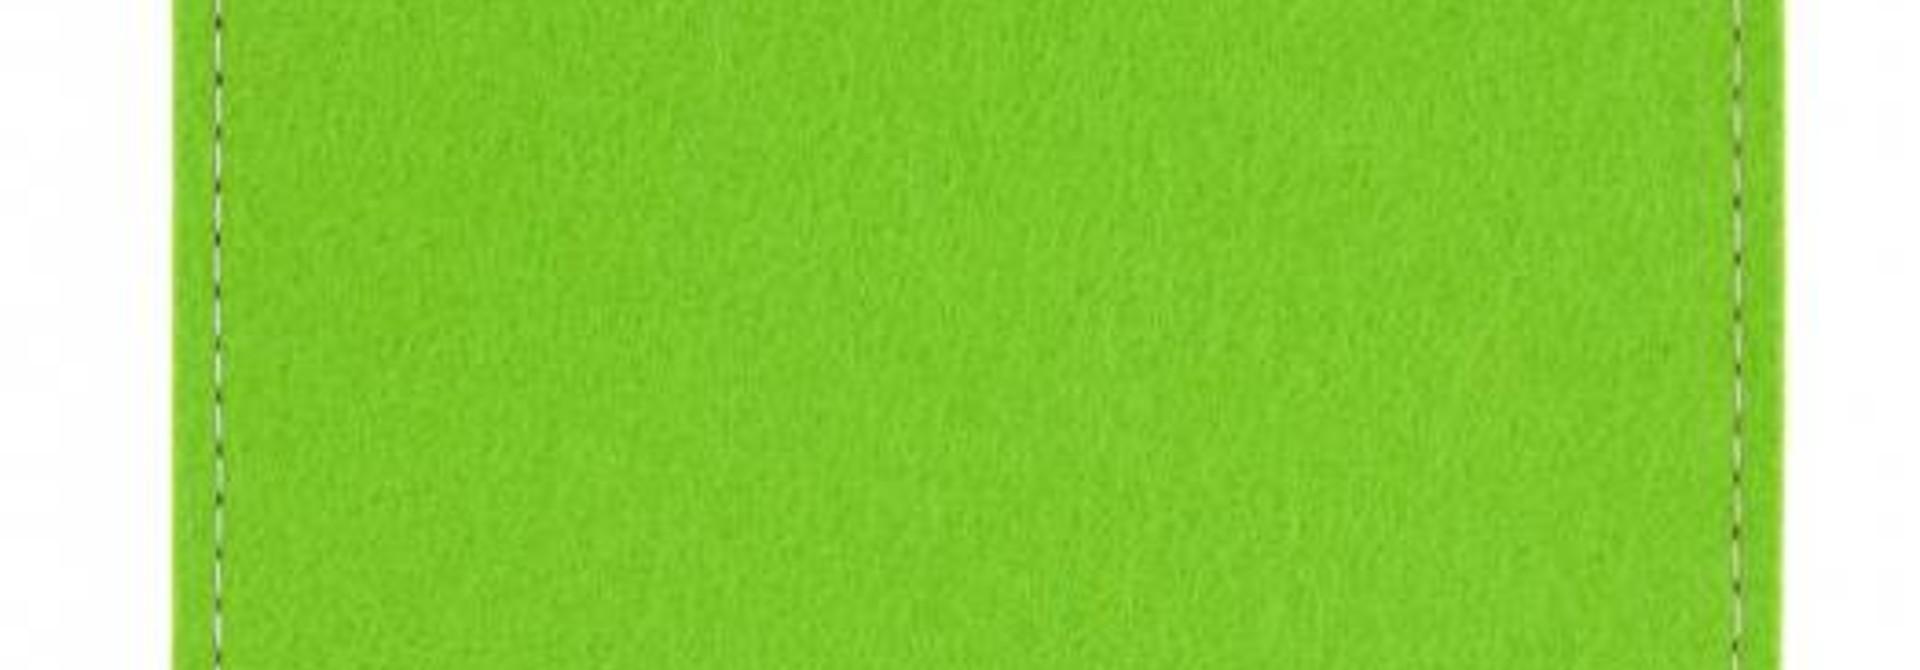 Magic Keyboard Sleeve Bright-Green